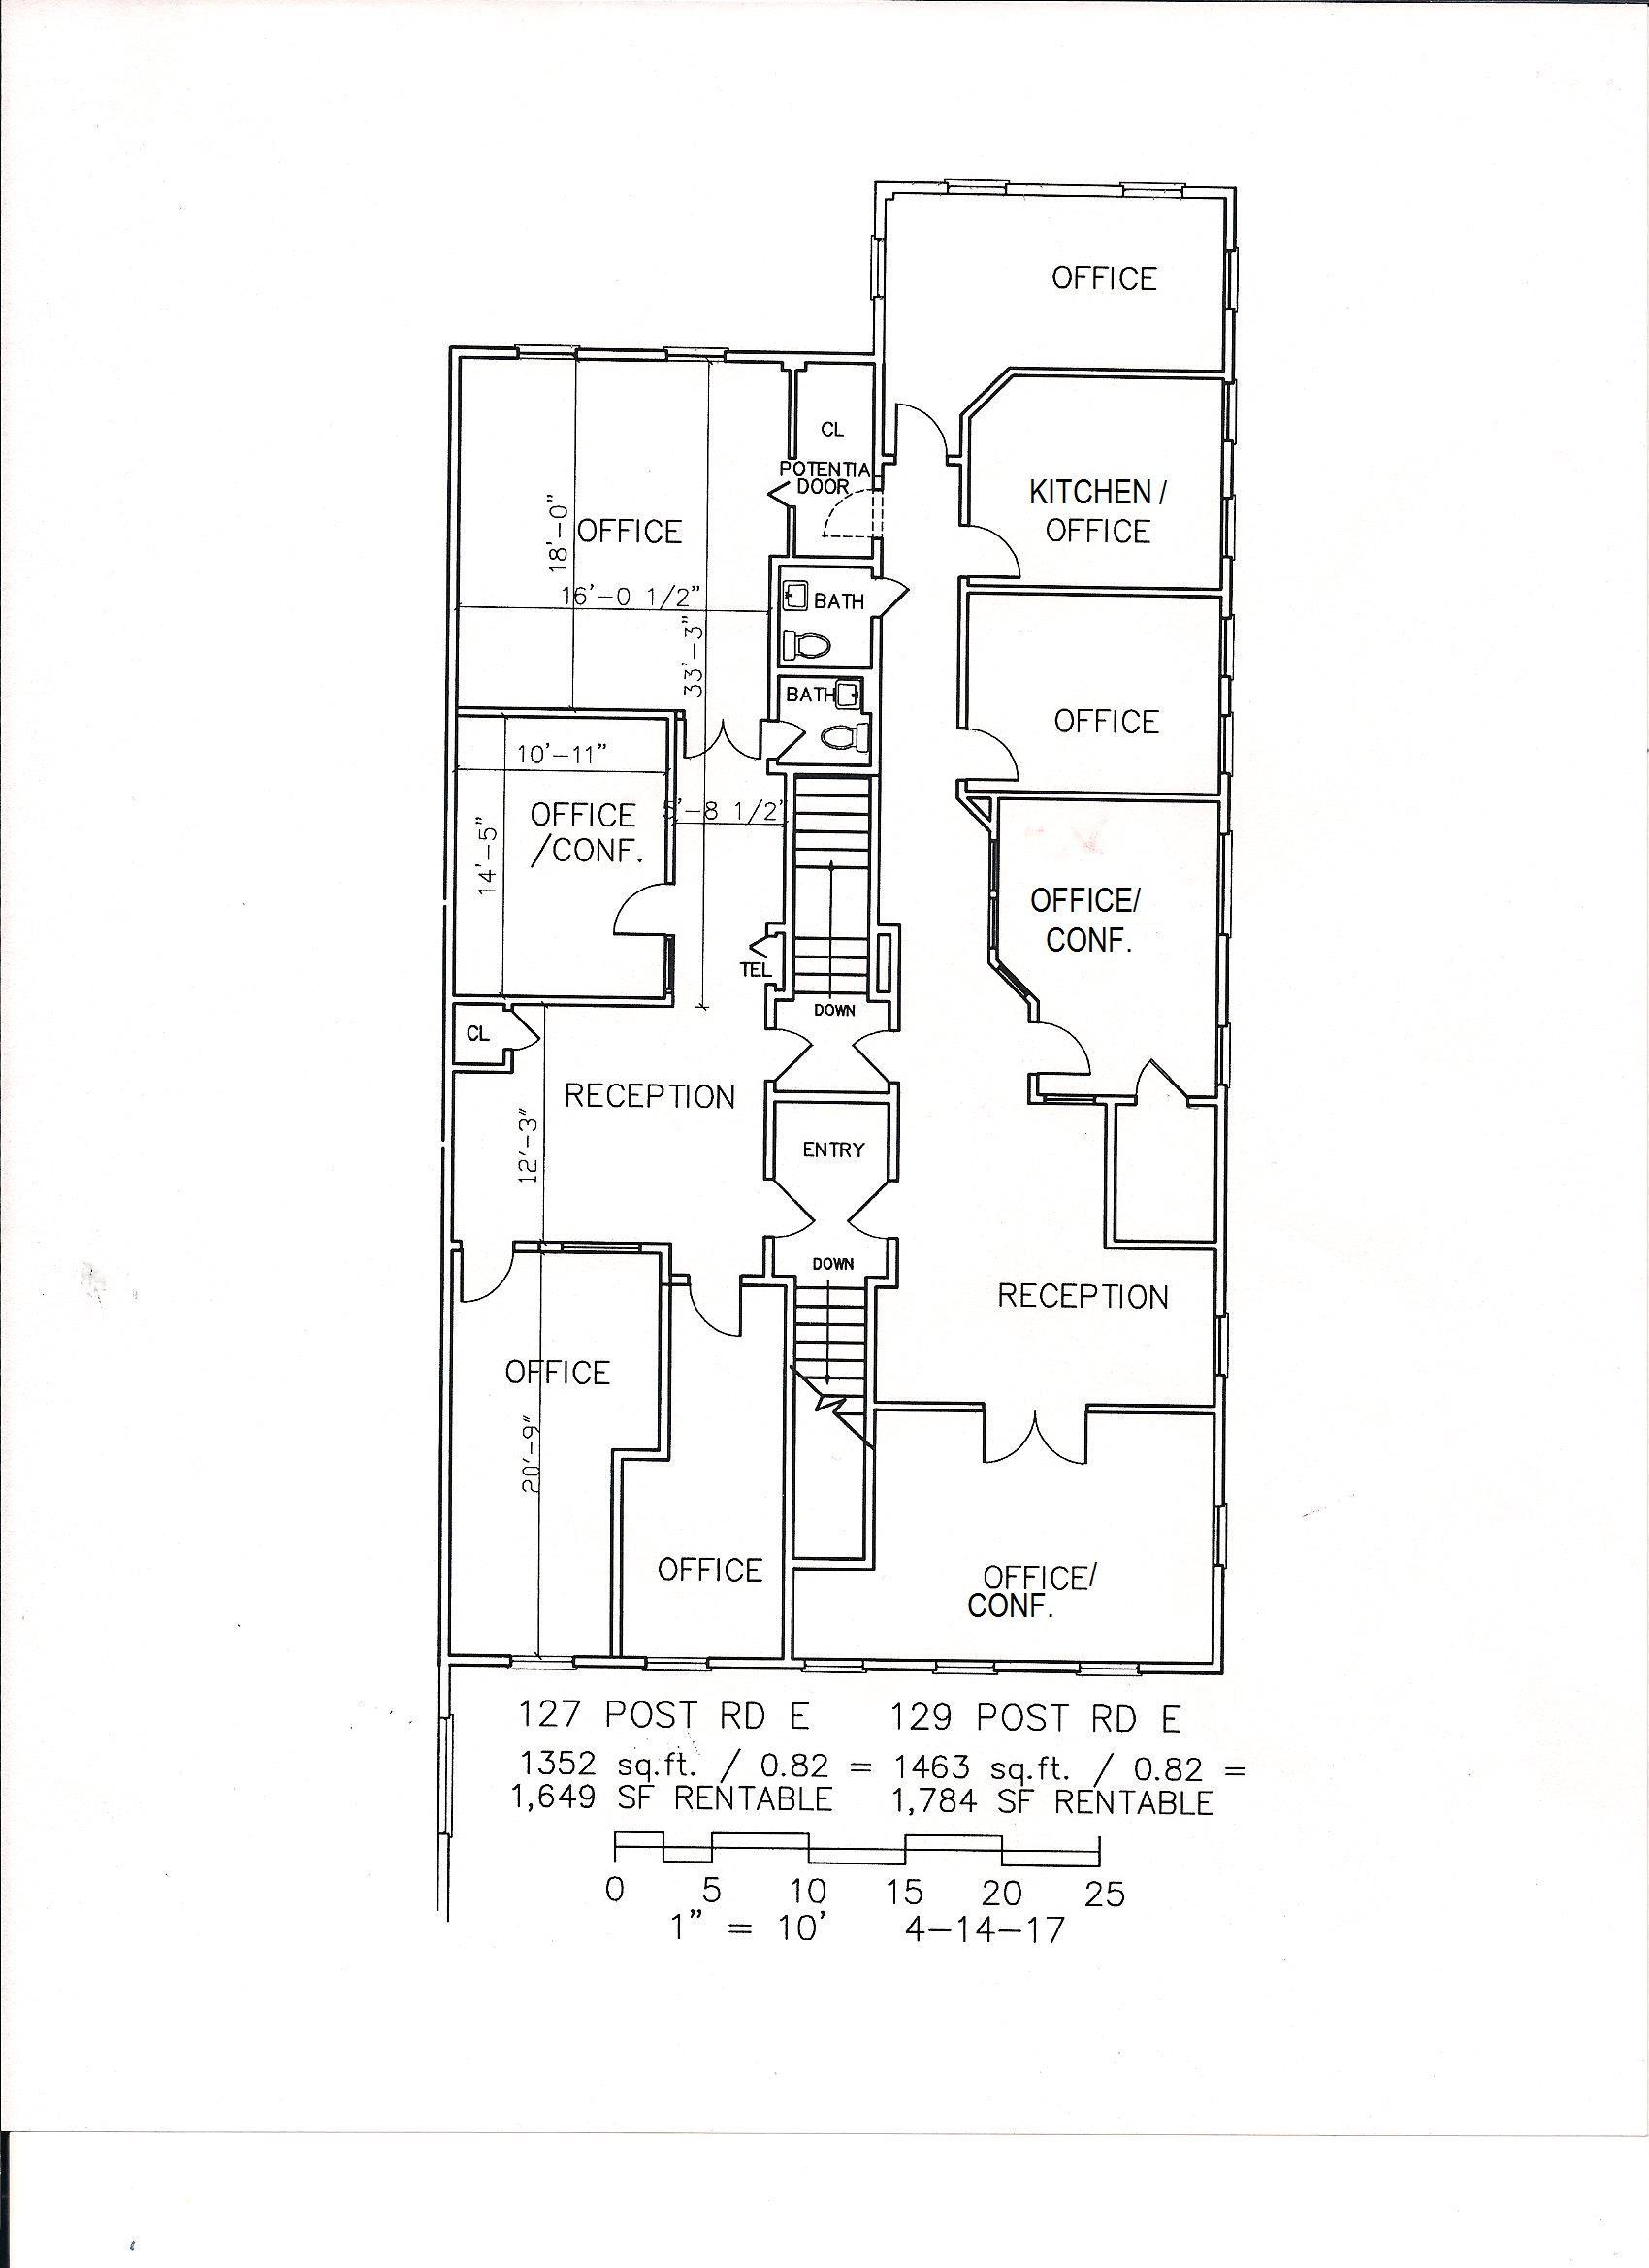 27 Totally Brilliant Single Office Floor Plan You Need To See Right Now Office Floor Plan Floor Plans Office Floor